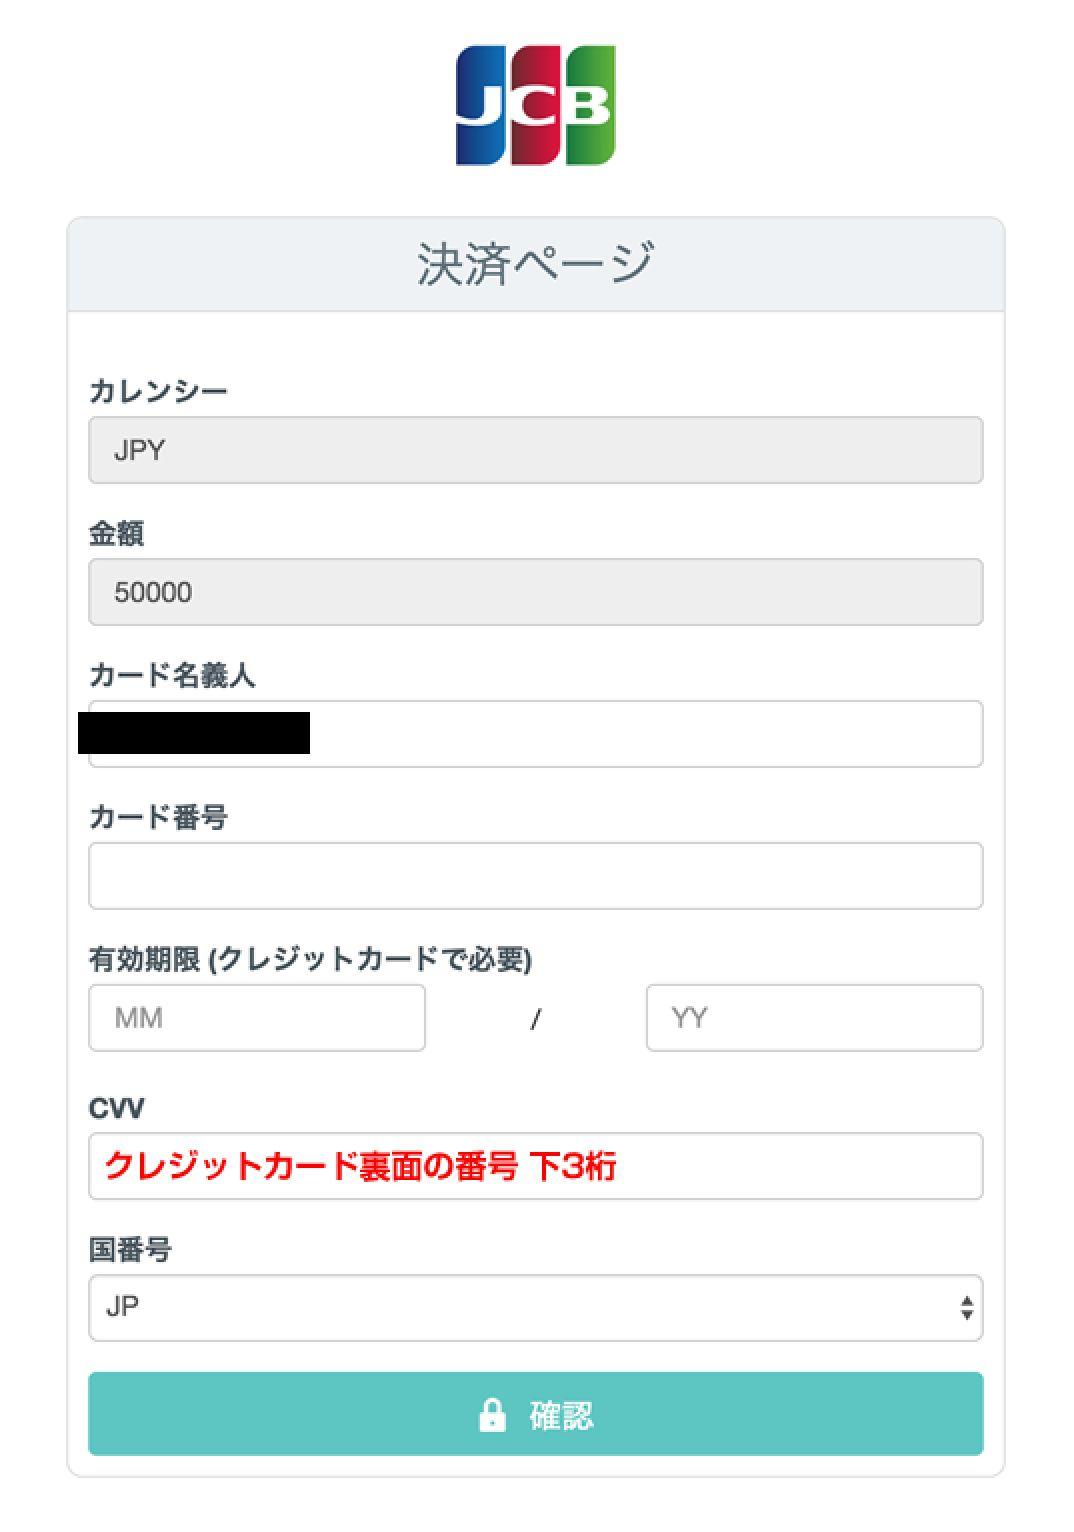 XMのJCB入金画面(クレジットカード入金時)